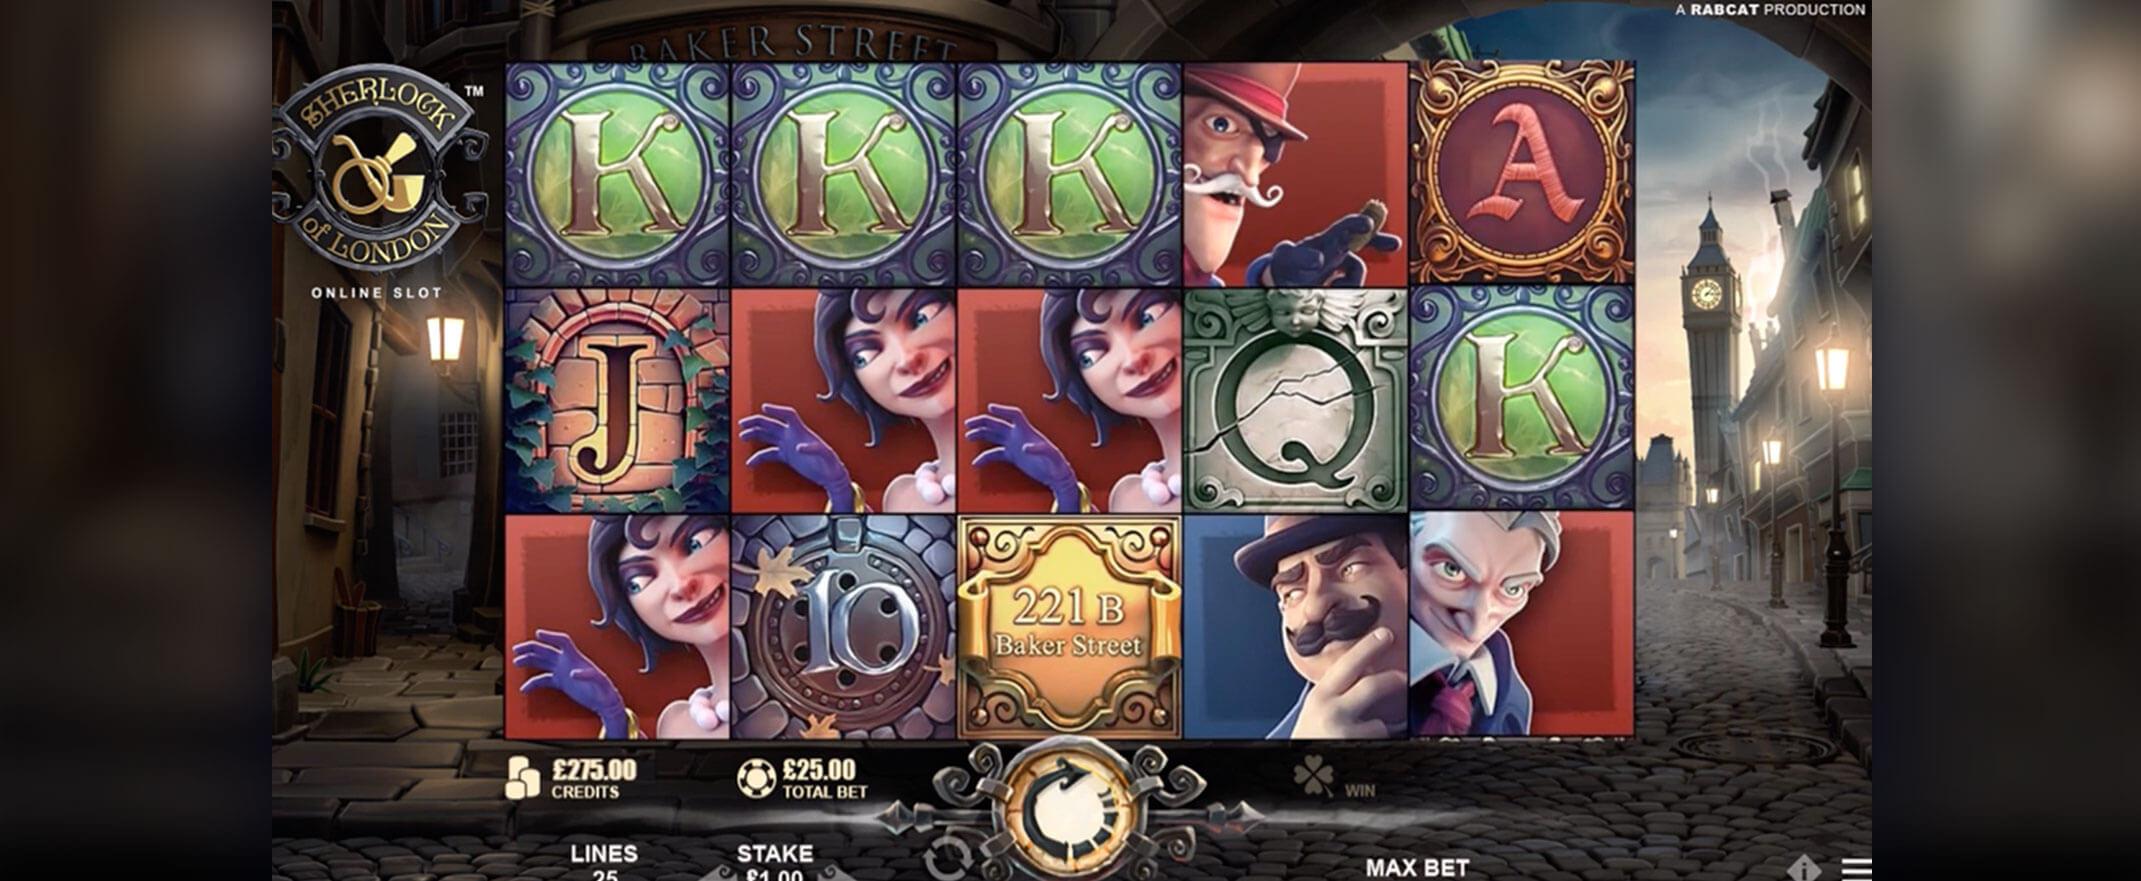 Sherlock of London Slot Gamepay